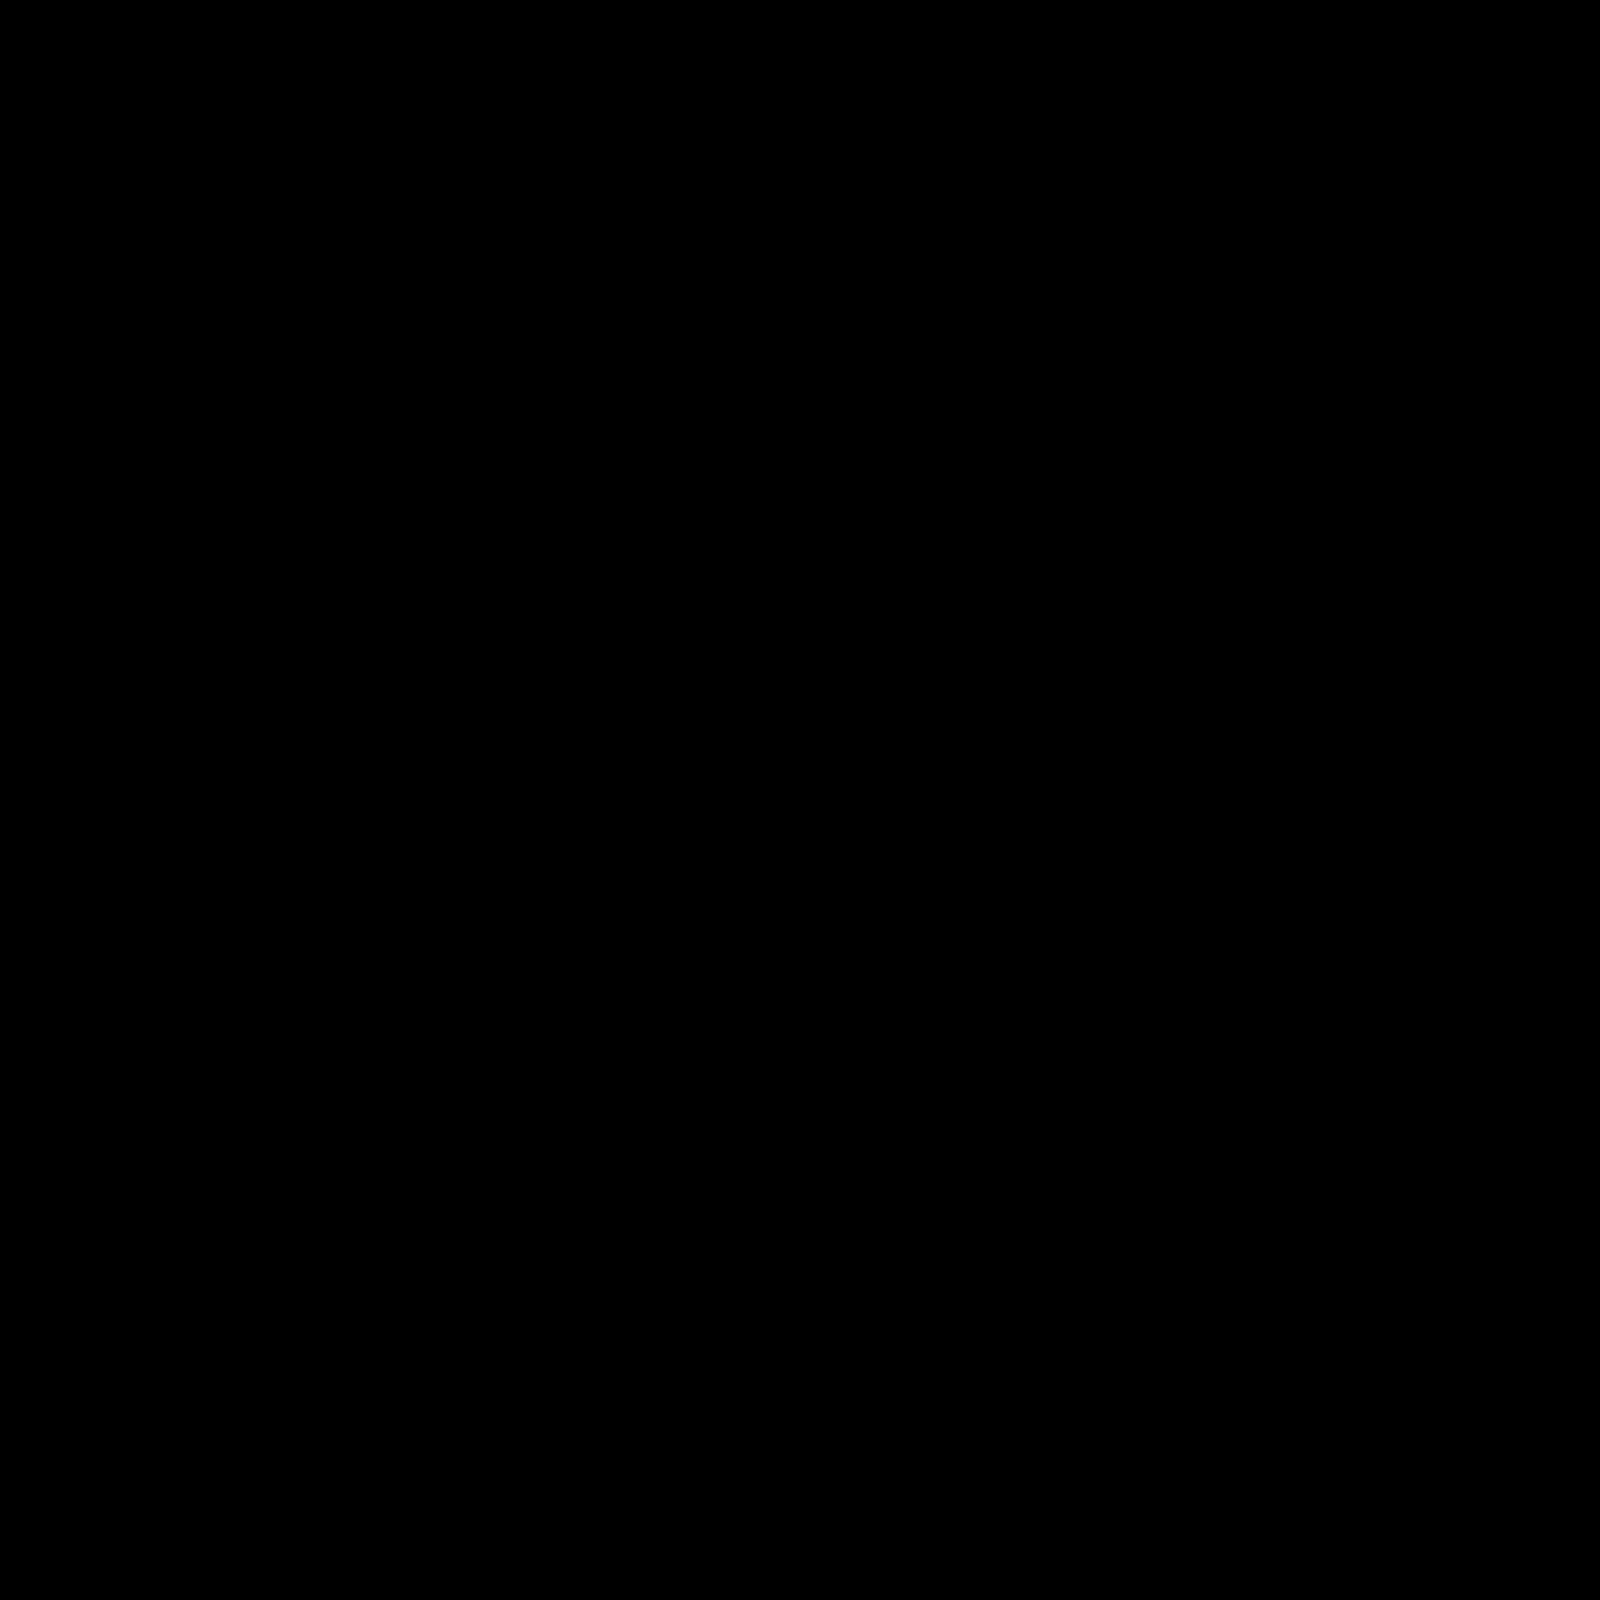 FBX icon